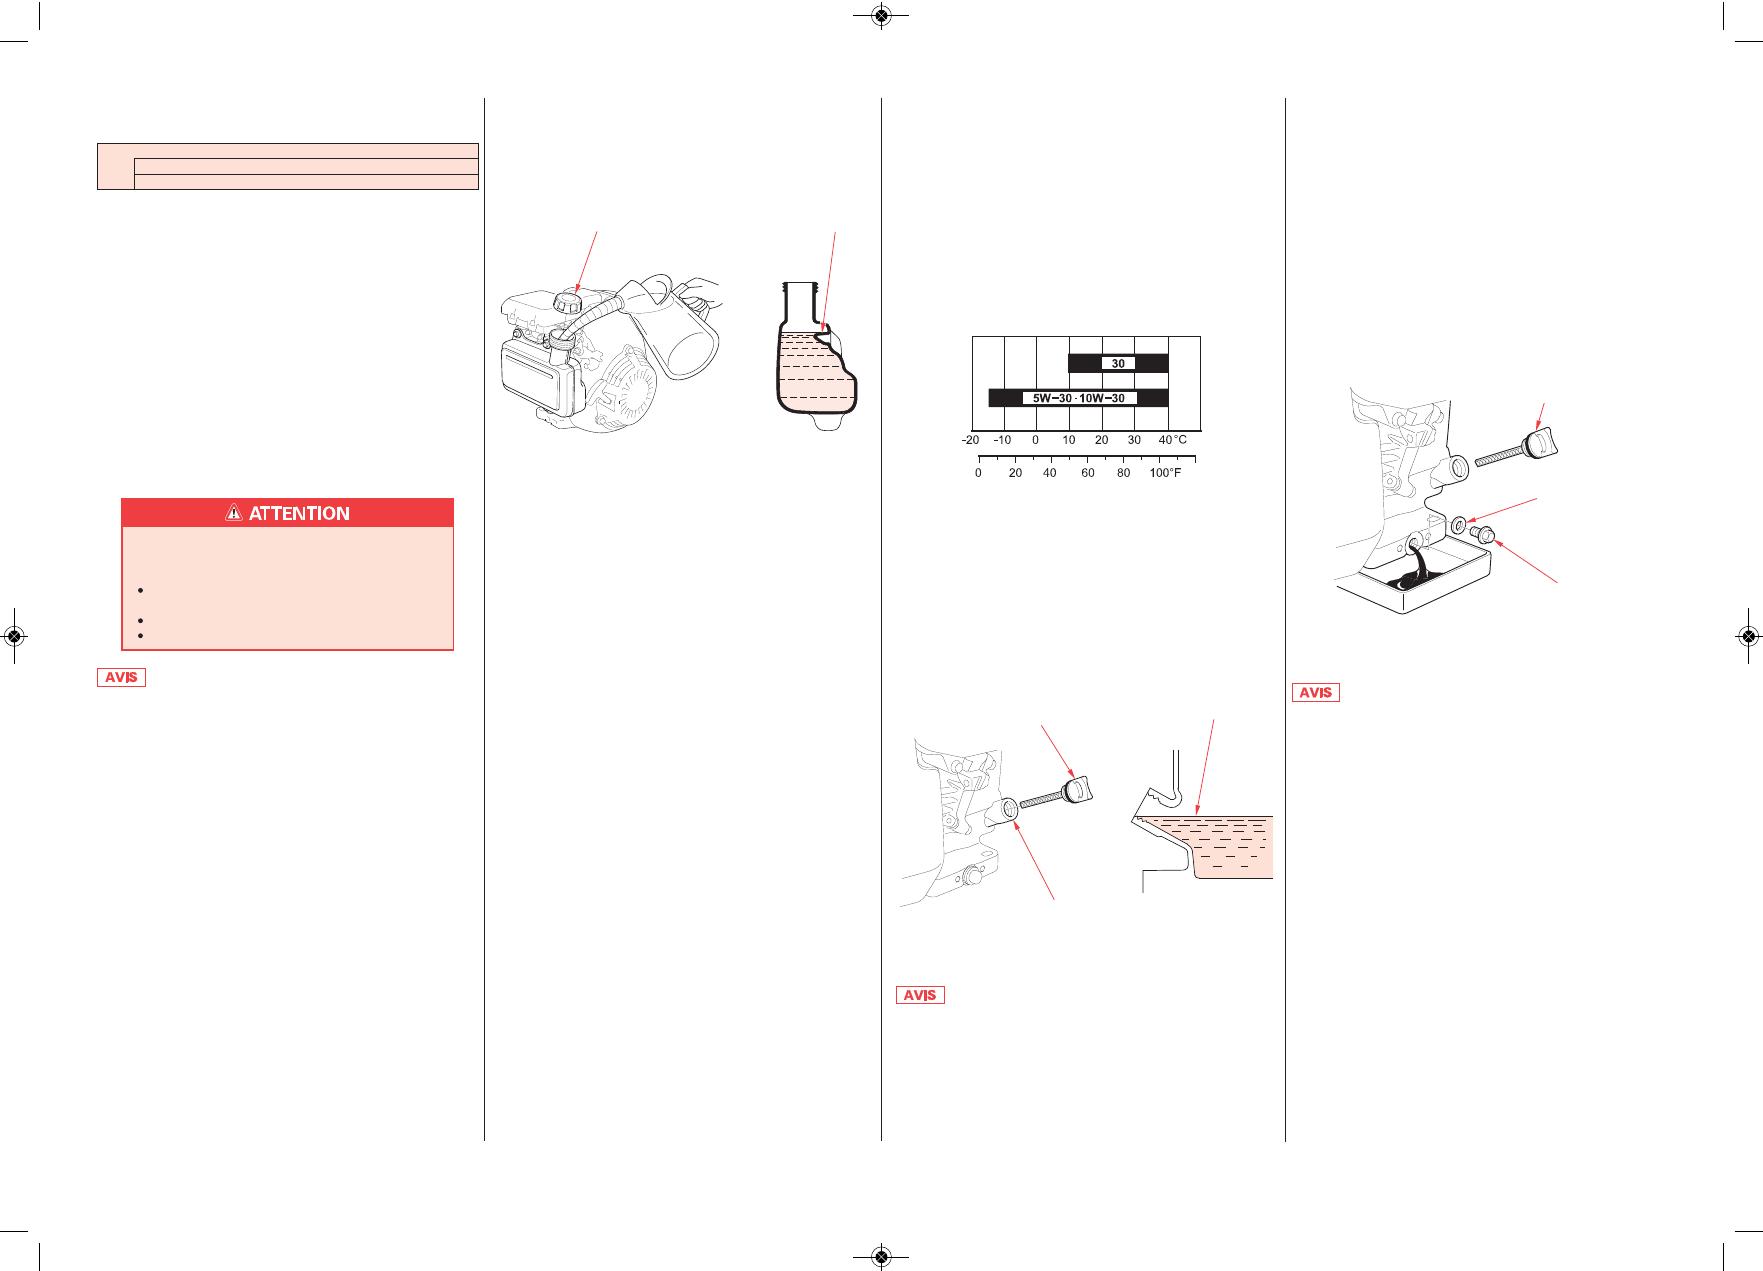 handleiding honda honda engines gc160 pagina 12 van 56 deutsch english espan l fran ais. Black Bedroom Furniture Sets. Home Design Ideas